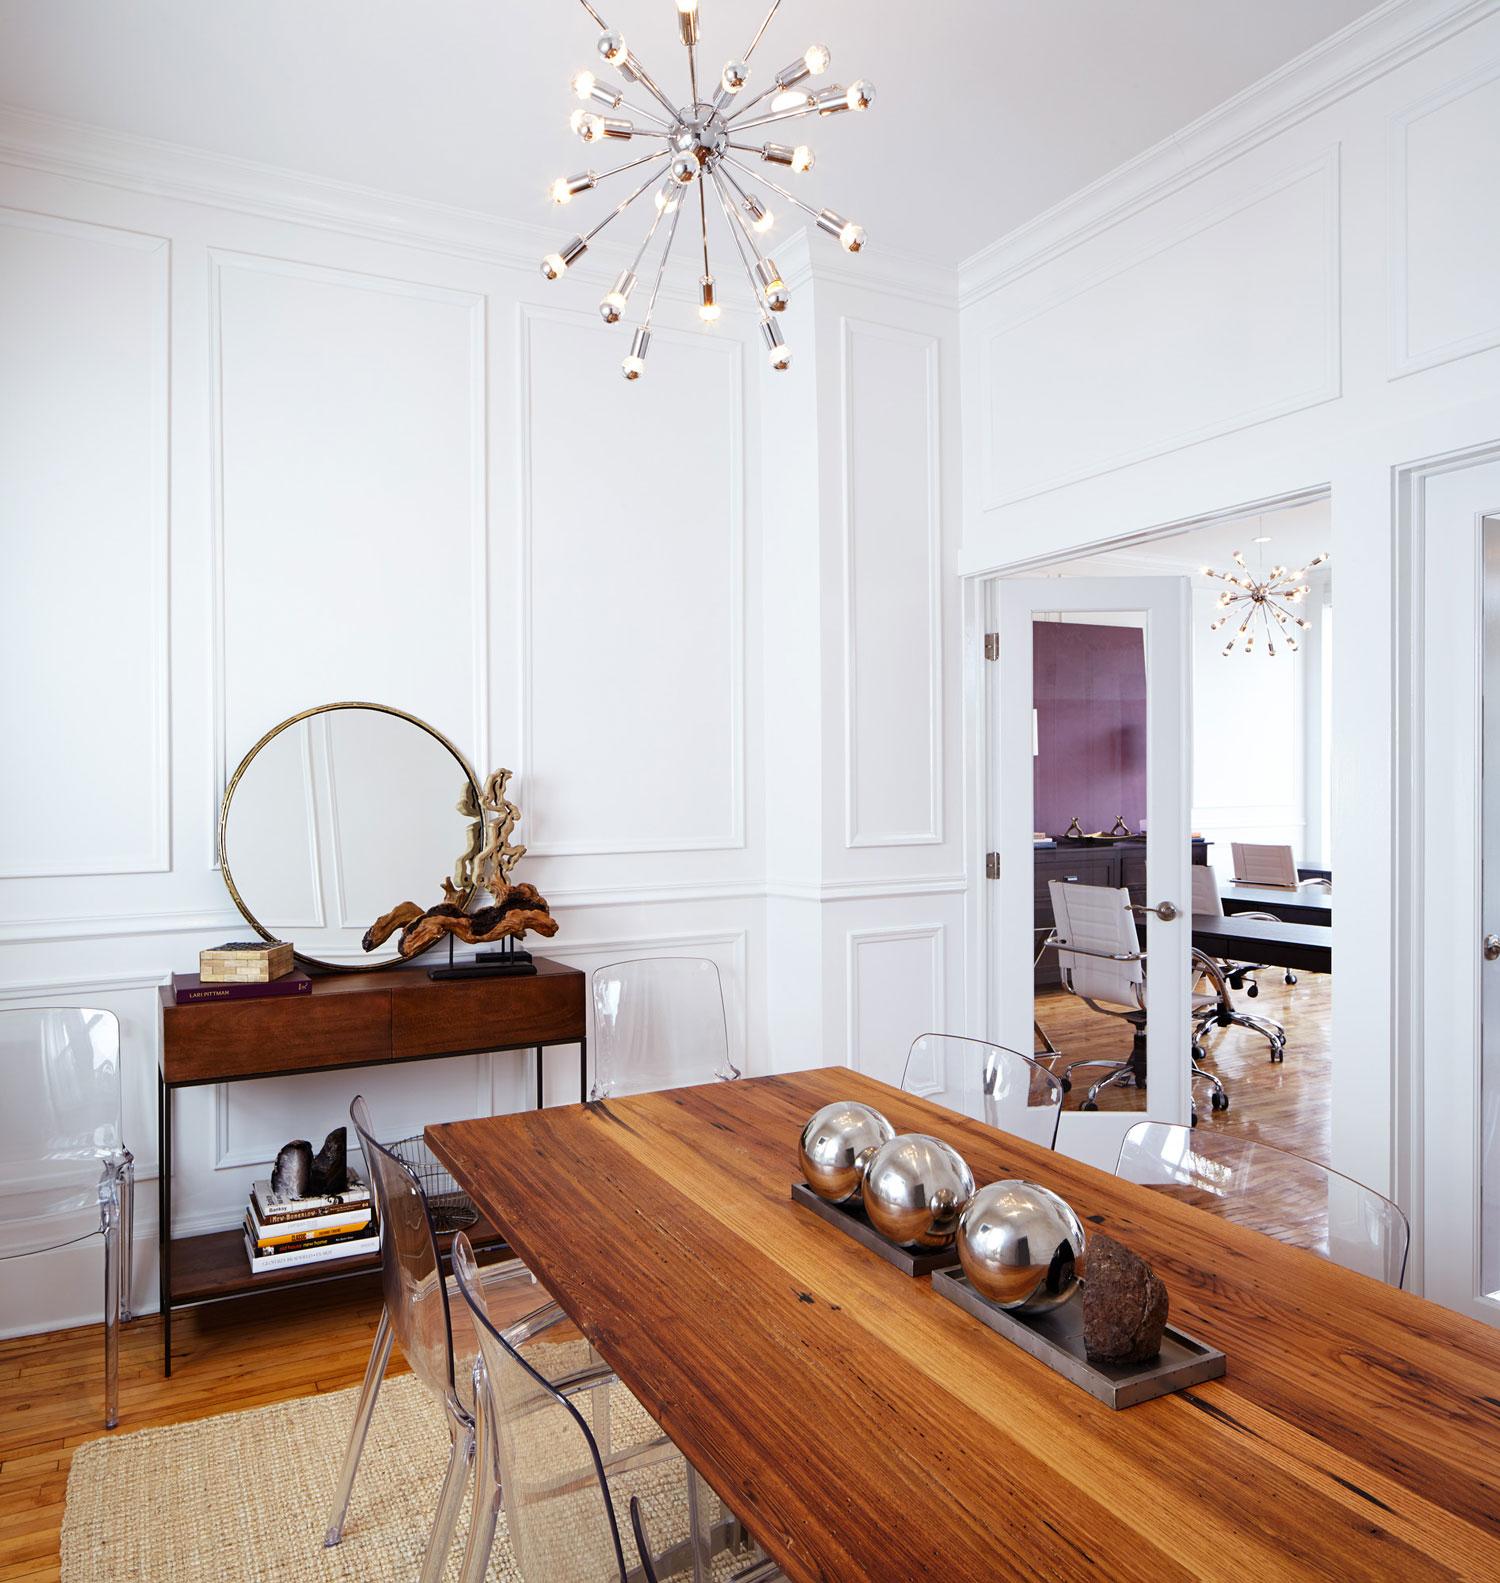 minneapolis-st-paul-home-decor-interior-designer-interior-stylist-interior-design-2.jpg